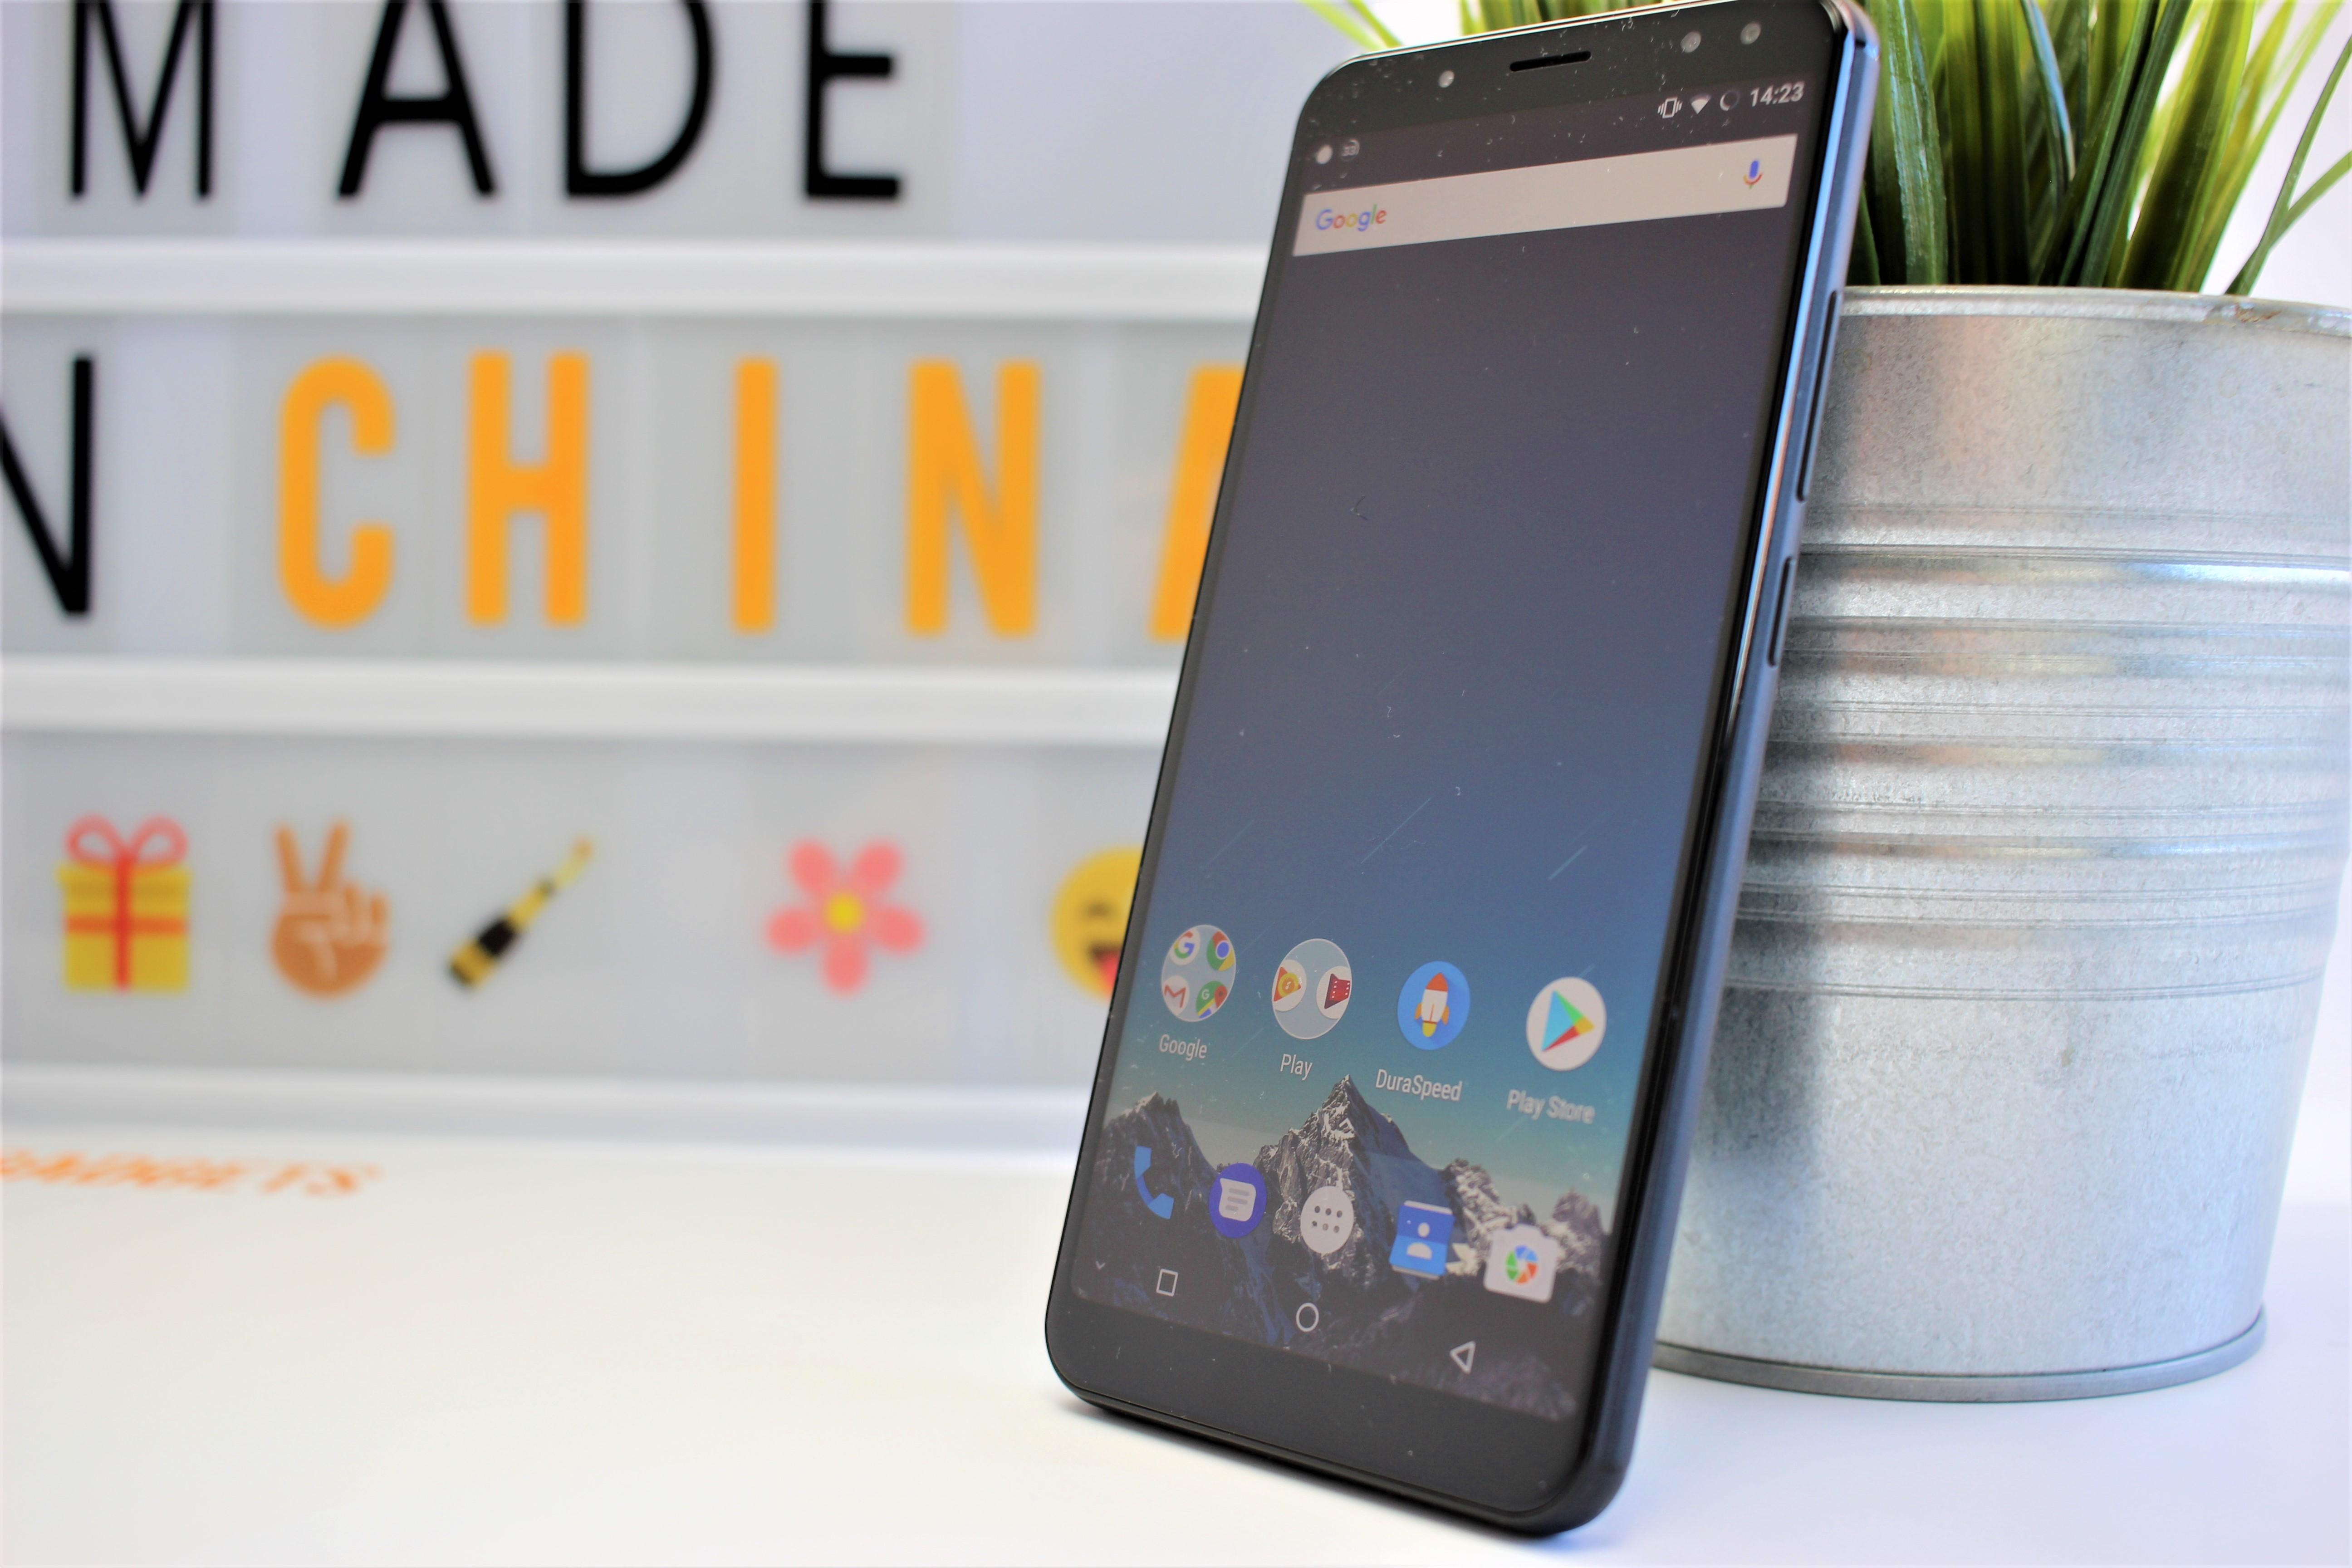 Vernee x akku monster smartphone mit 6 zoll display im test